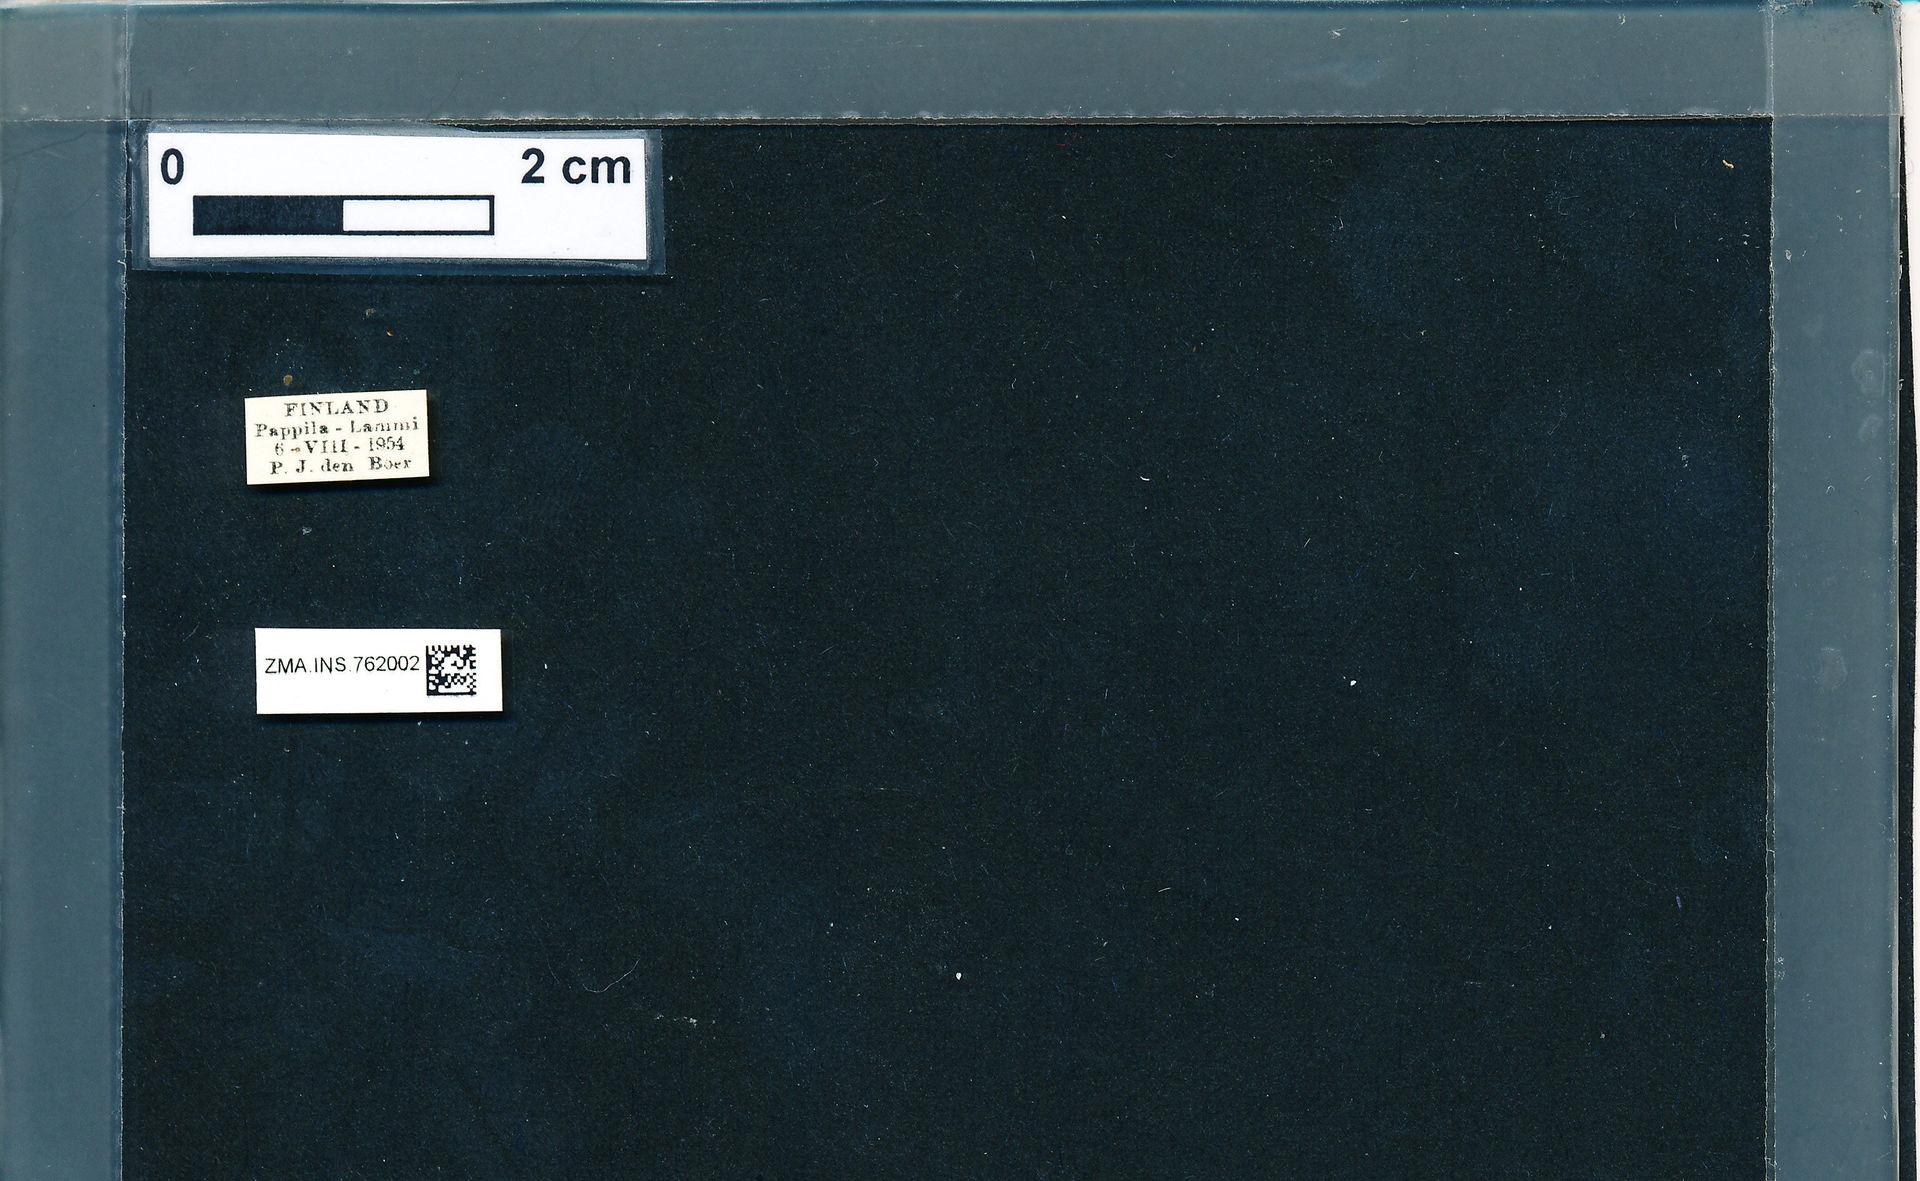 ZMA.INS.762002 | Bombus (Pyrobombus) pratorum pratorum (Linnaeus, 1761)